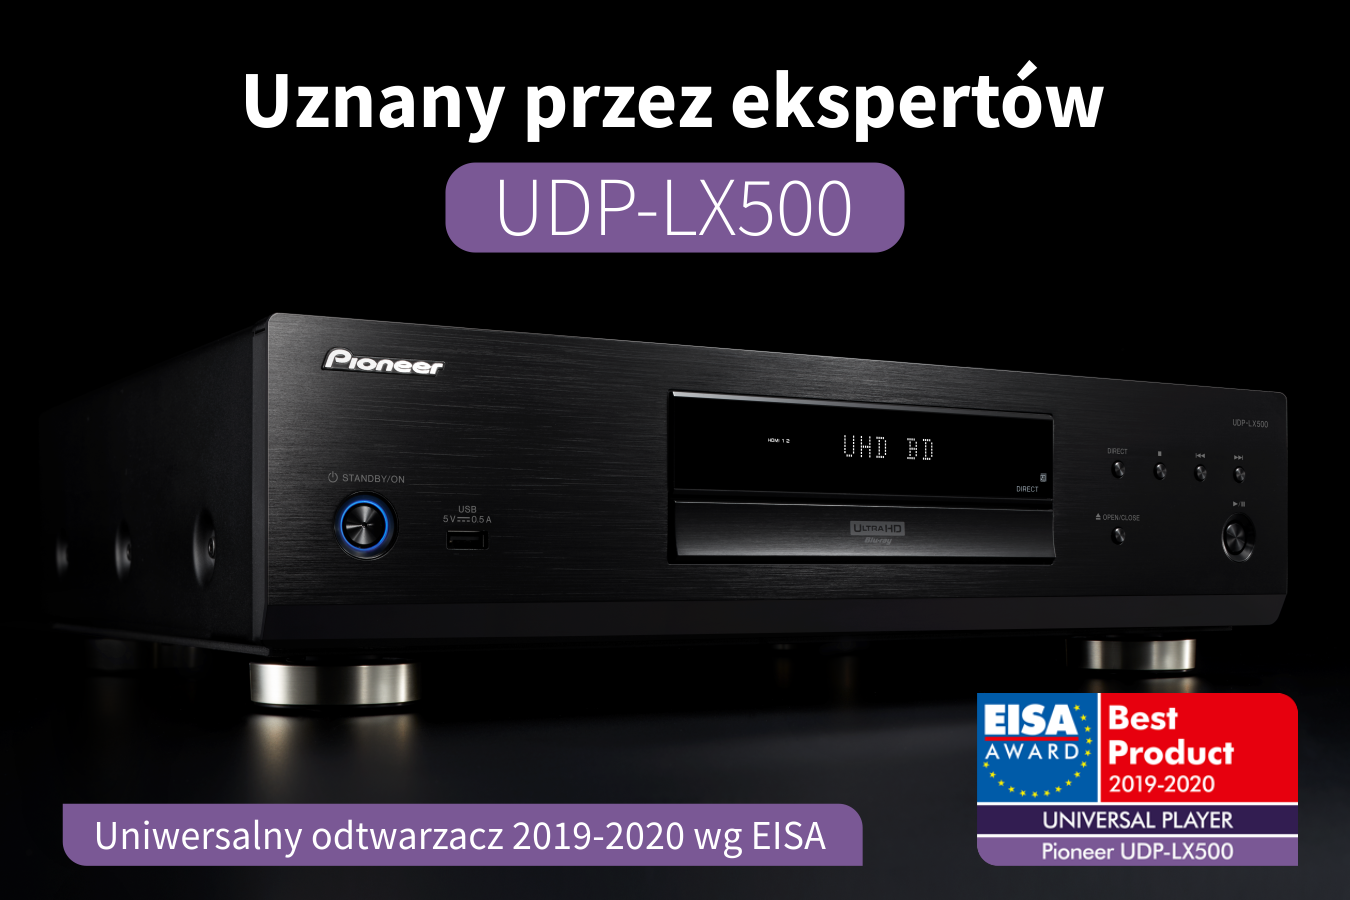 Nagroda EISA 2019-2020 dla Pioneer UDP-LX500